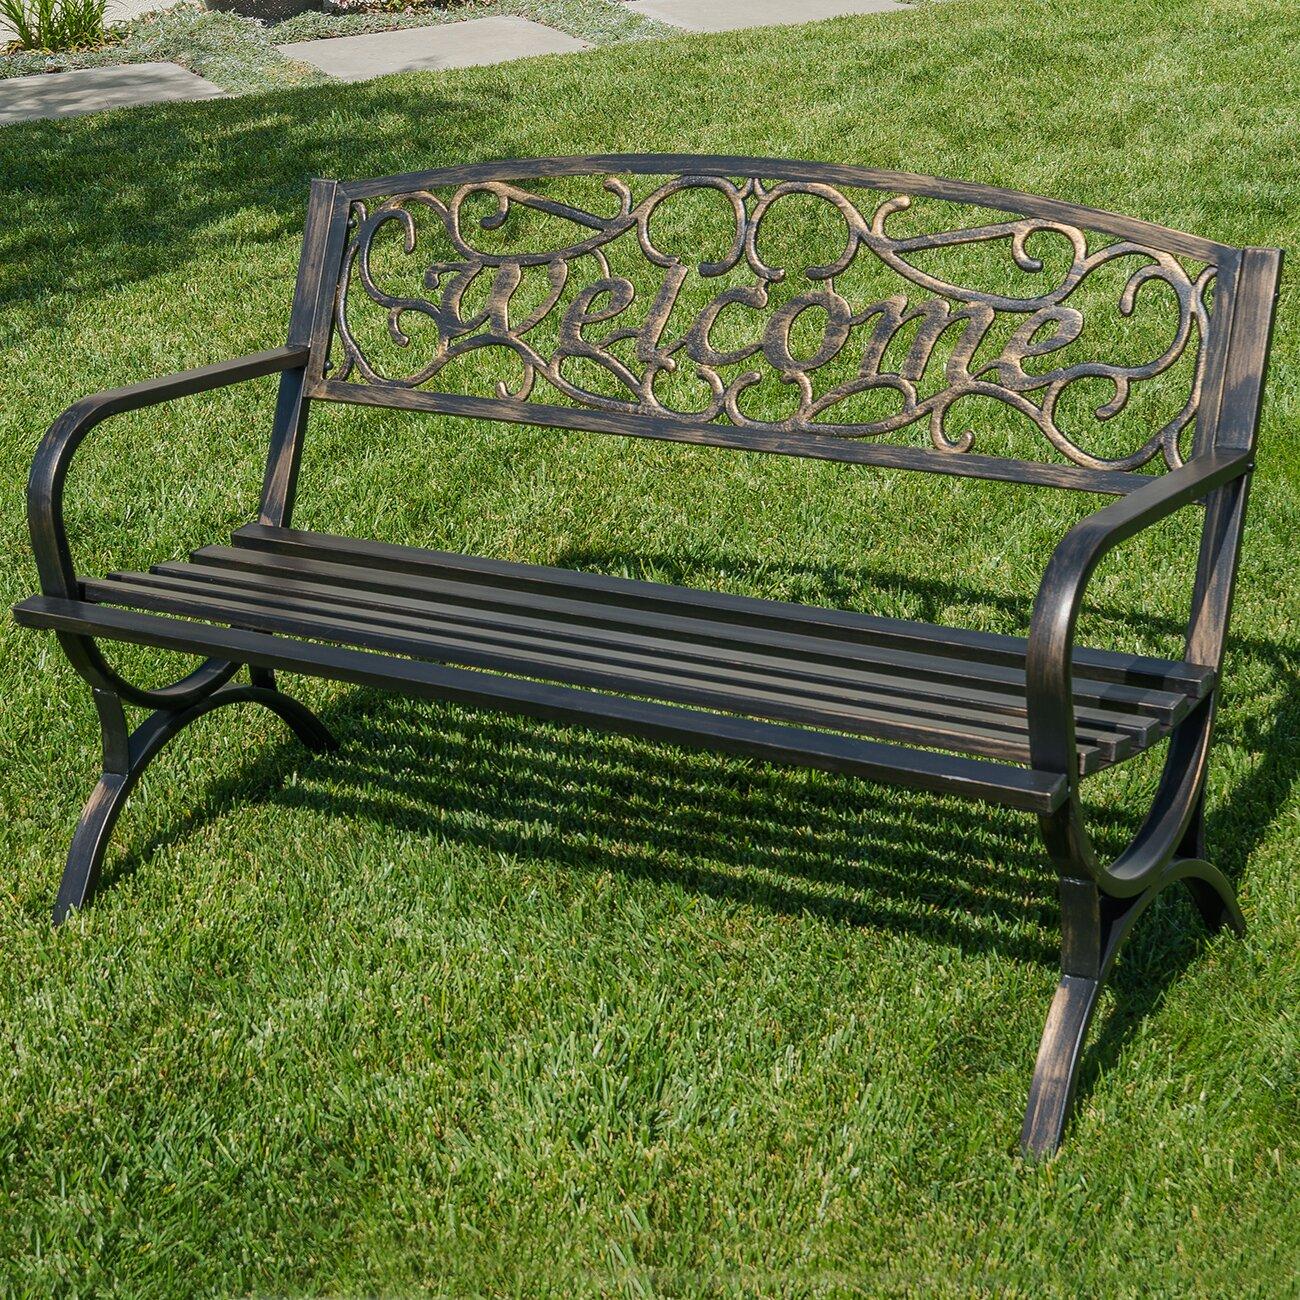 Belleze Outdoor Metal Park Bench Amp Reviews Wayfair Ca